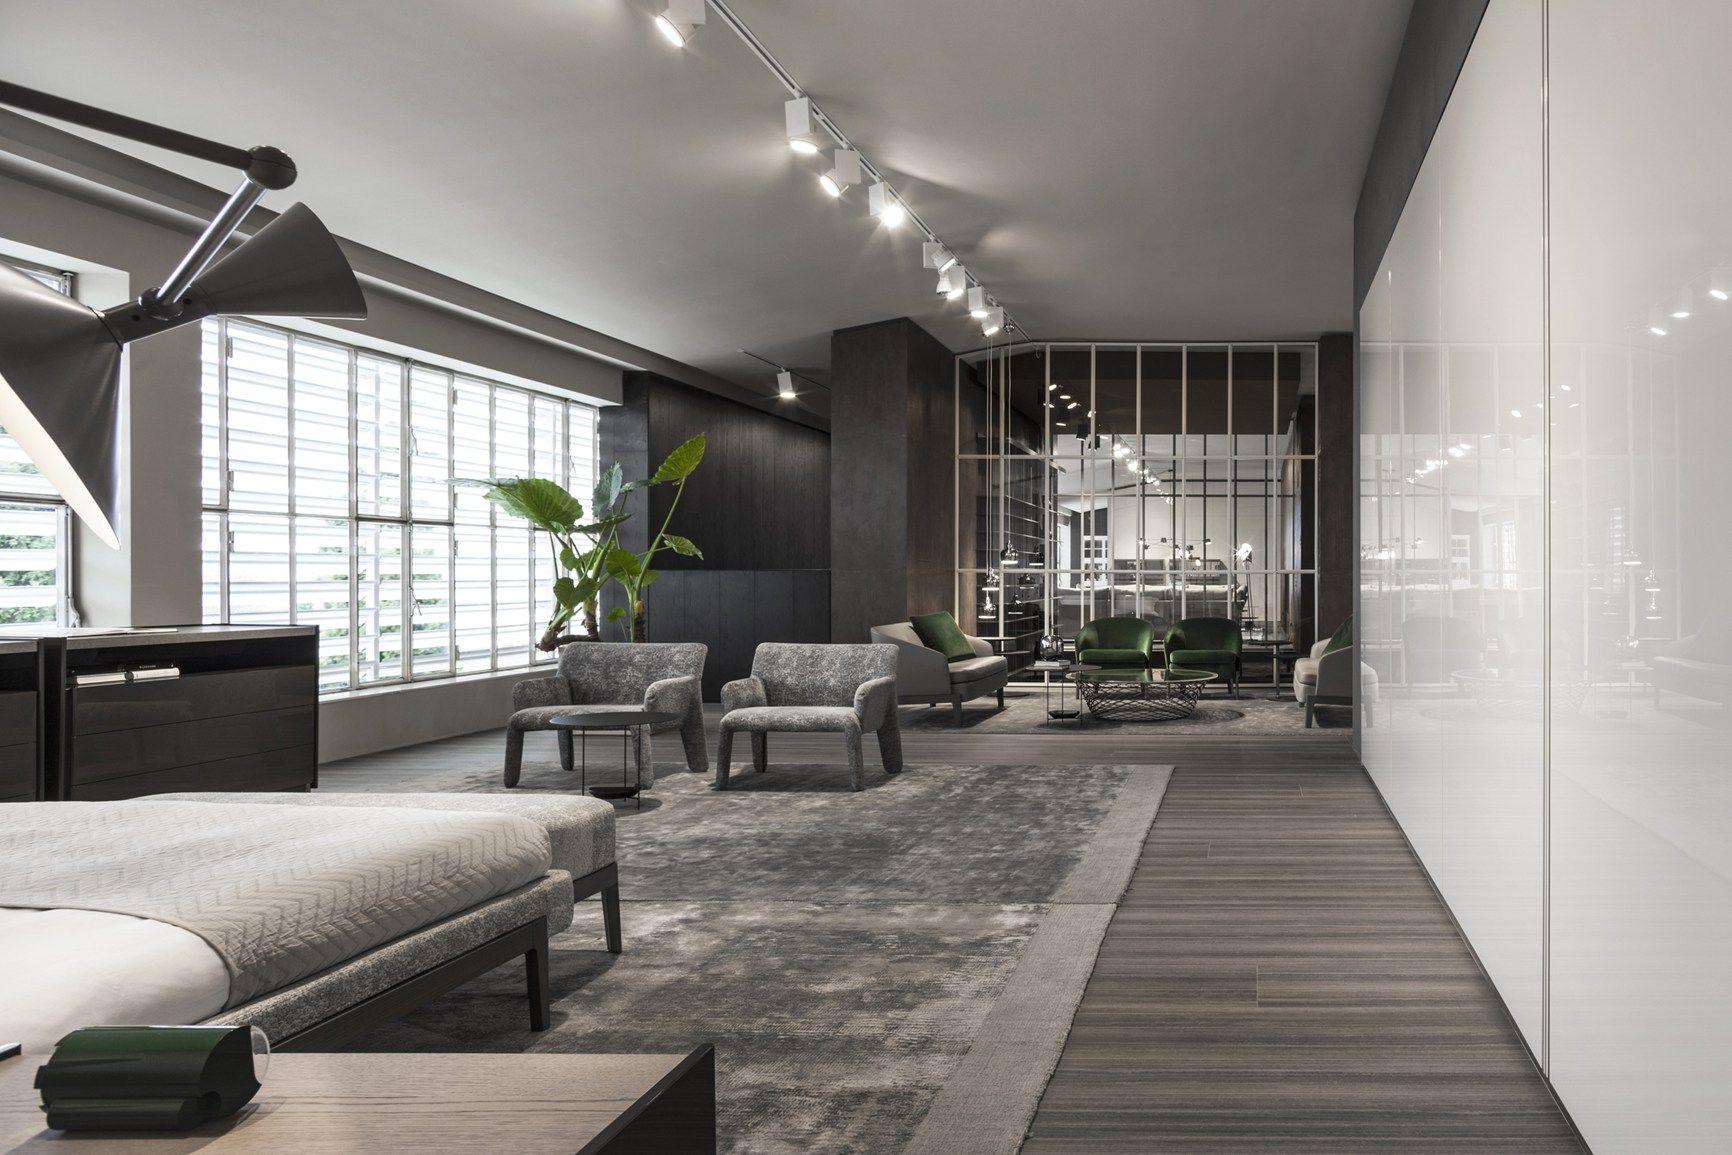 vincent van duysen molteni c dada. Black Bedroom Furniture Sets. Home Design Ideas